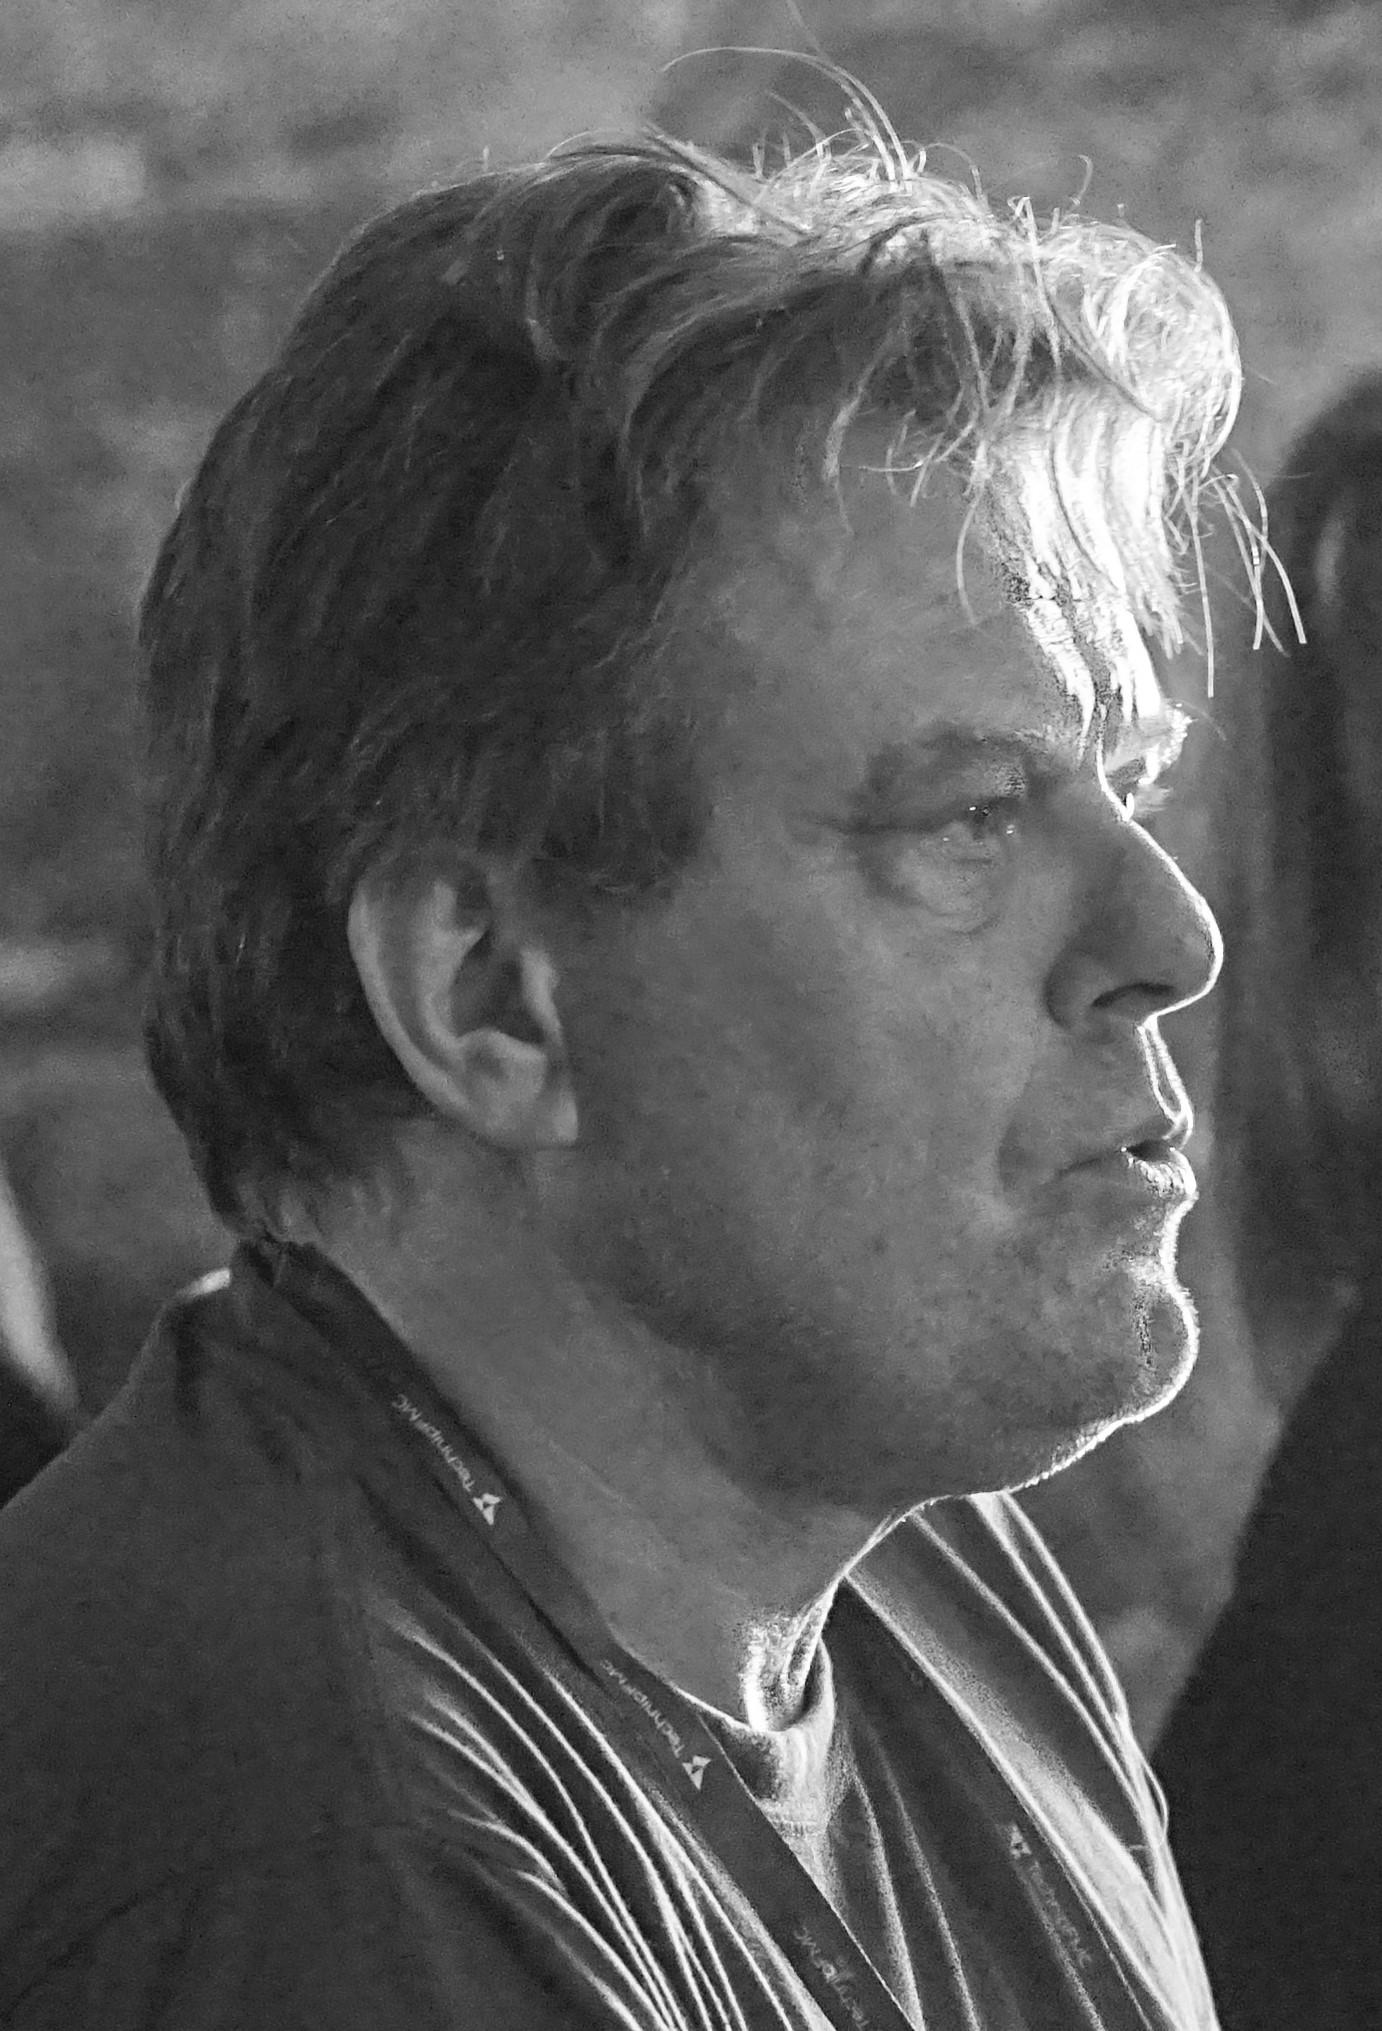 Johan Hauknes